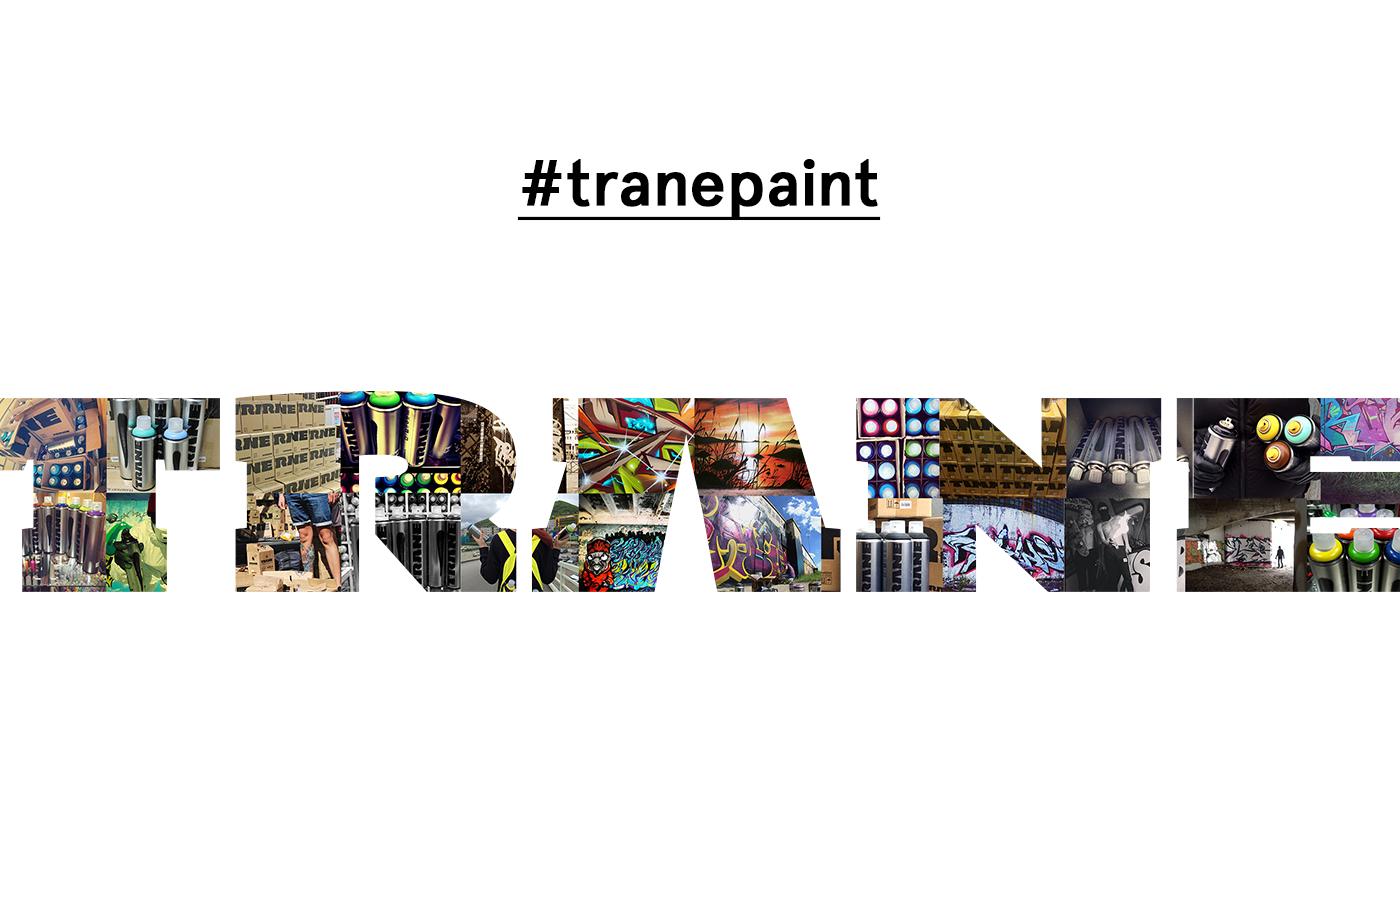 spray paint spraypaint Graffity Street art free